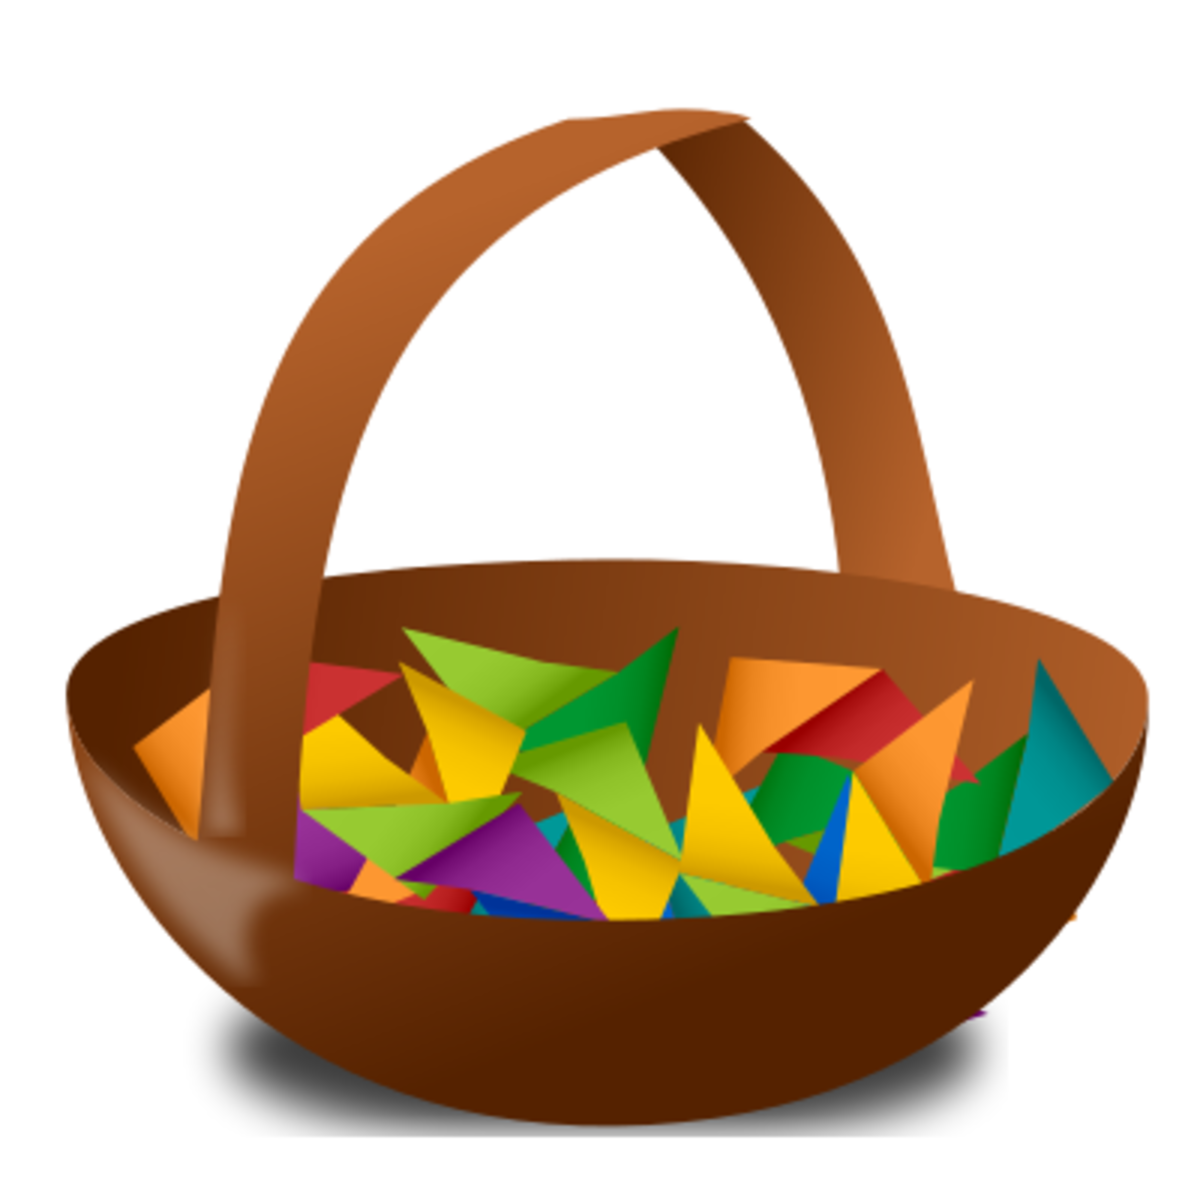 A basket raffle.